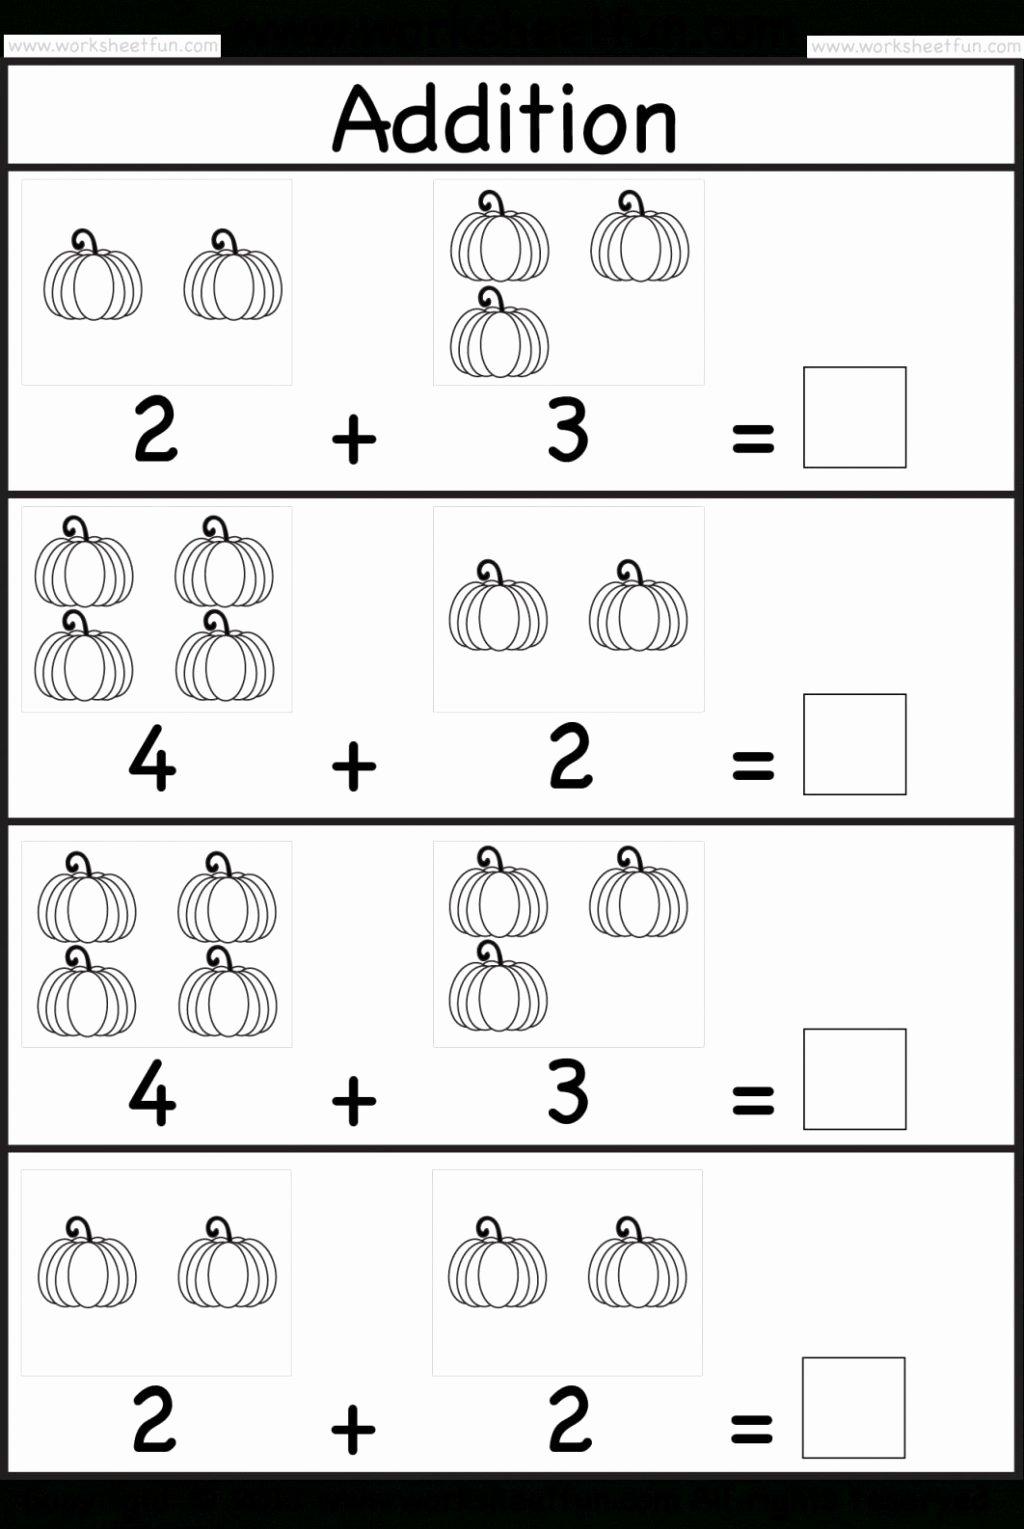 Simple Math Worksheets for Preschoolers top Worksheet Fantastic Grade K Maths Simple Kindergarten for